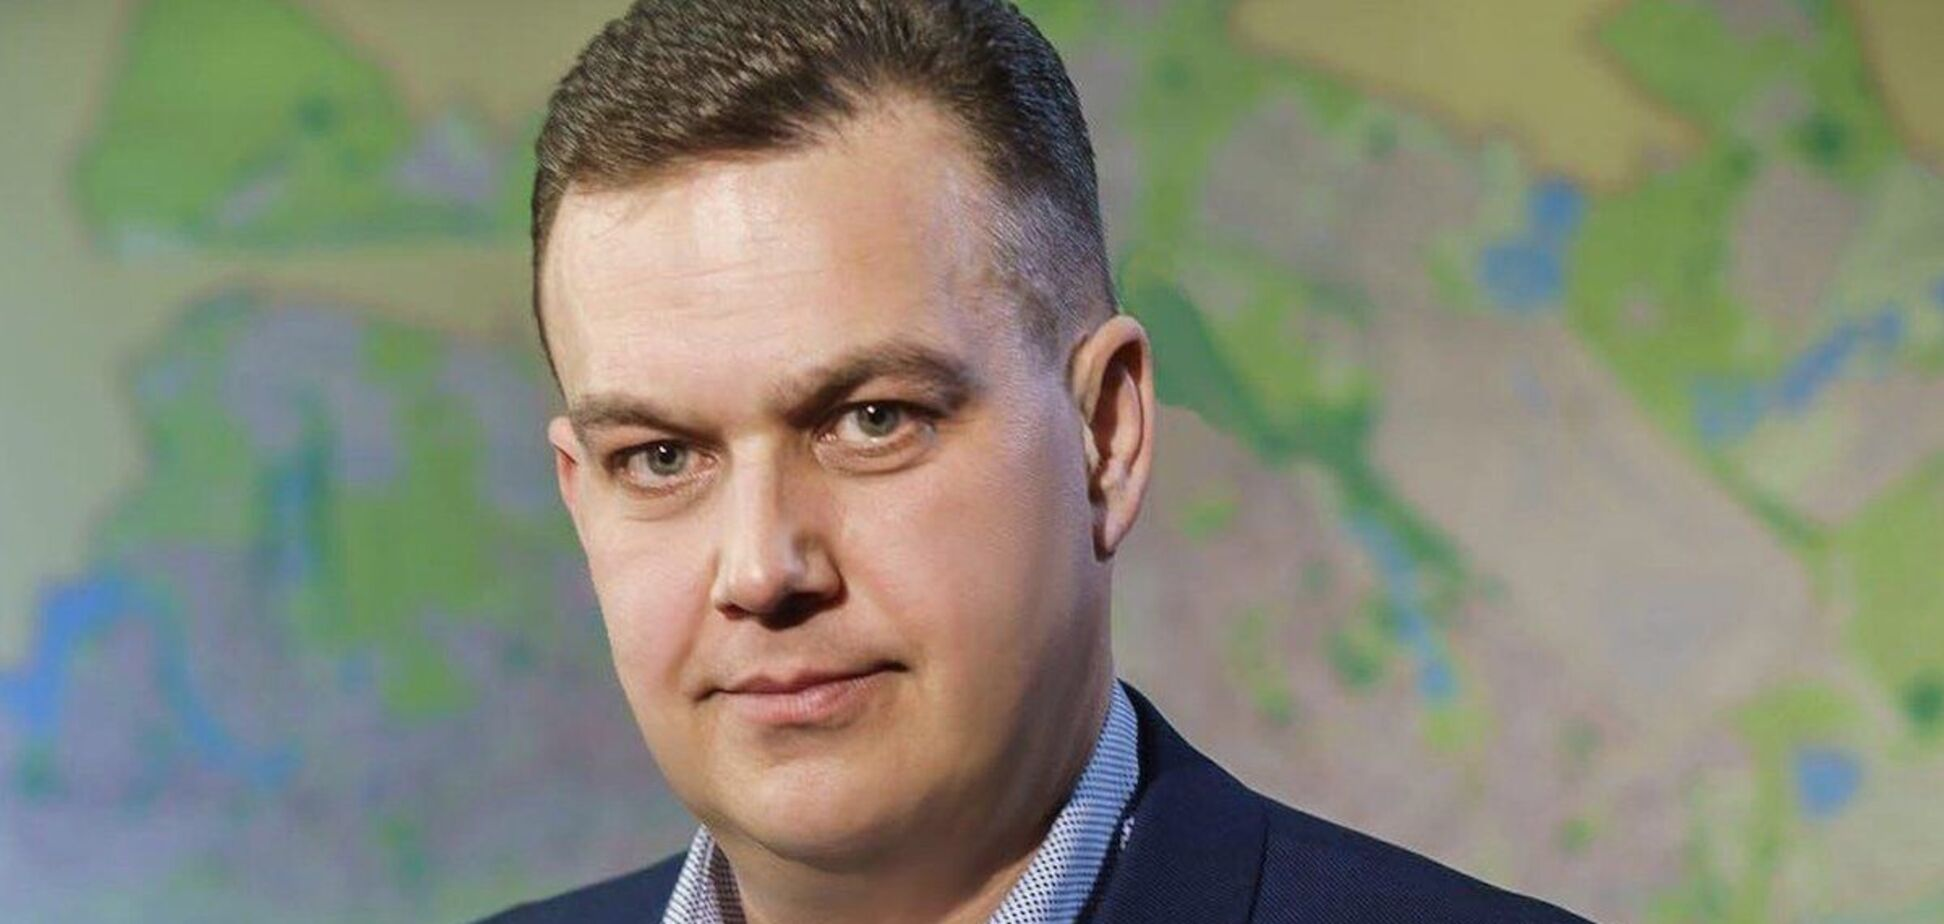 Новый мэр Кривого Рога Константин Павлов